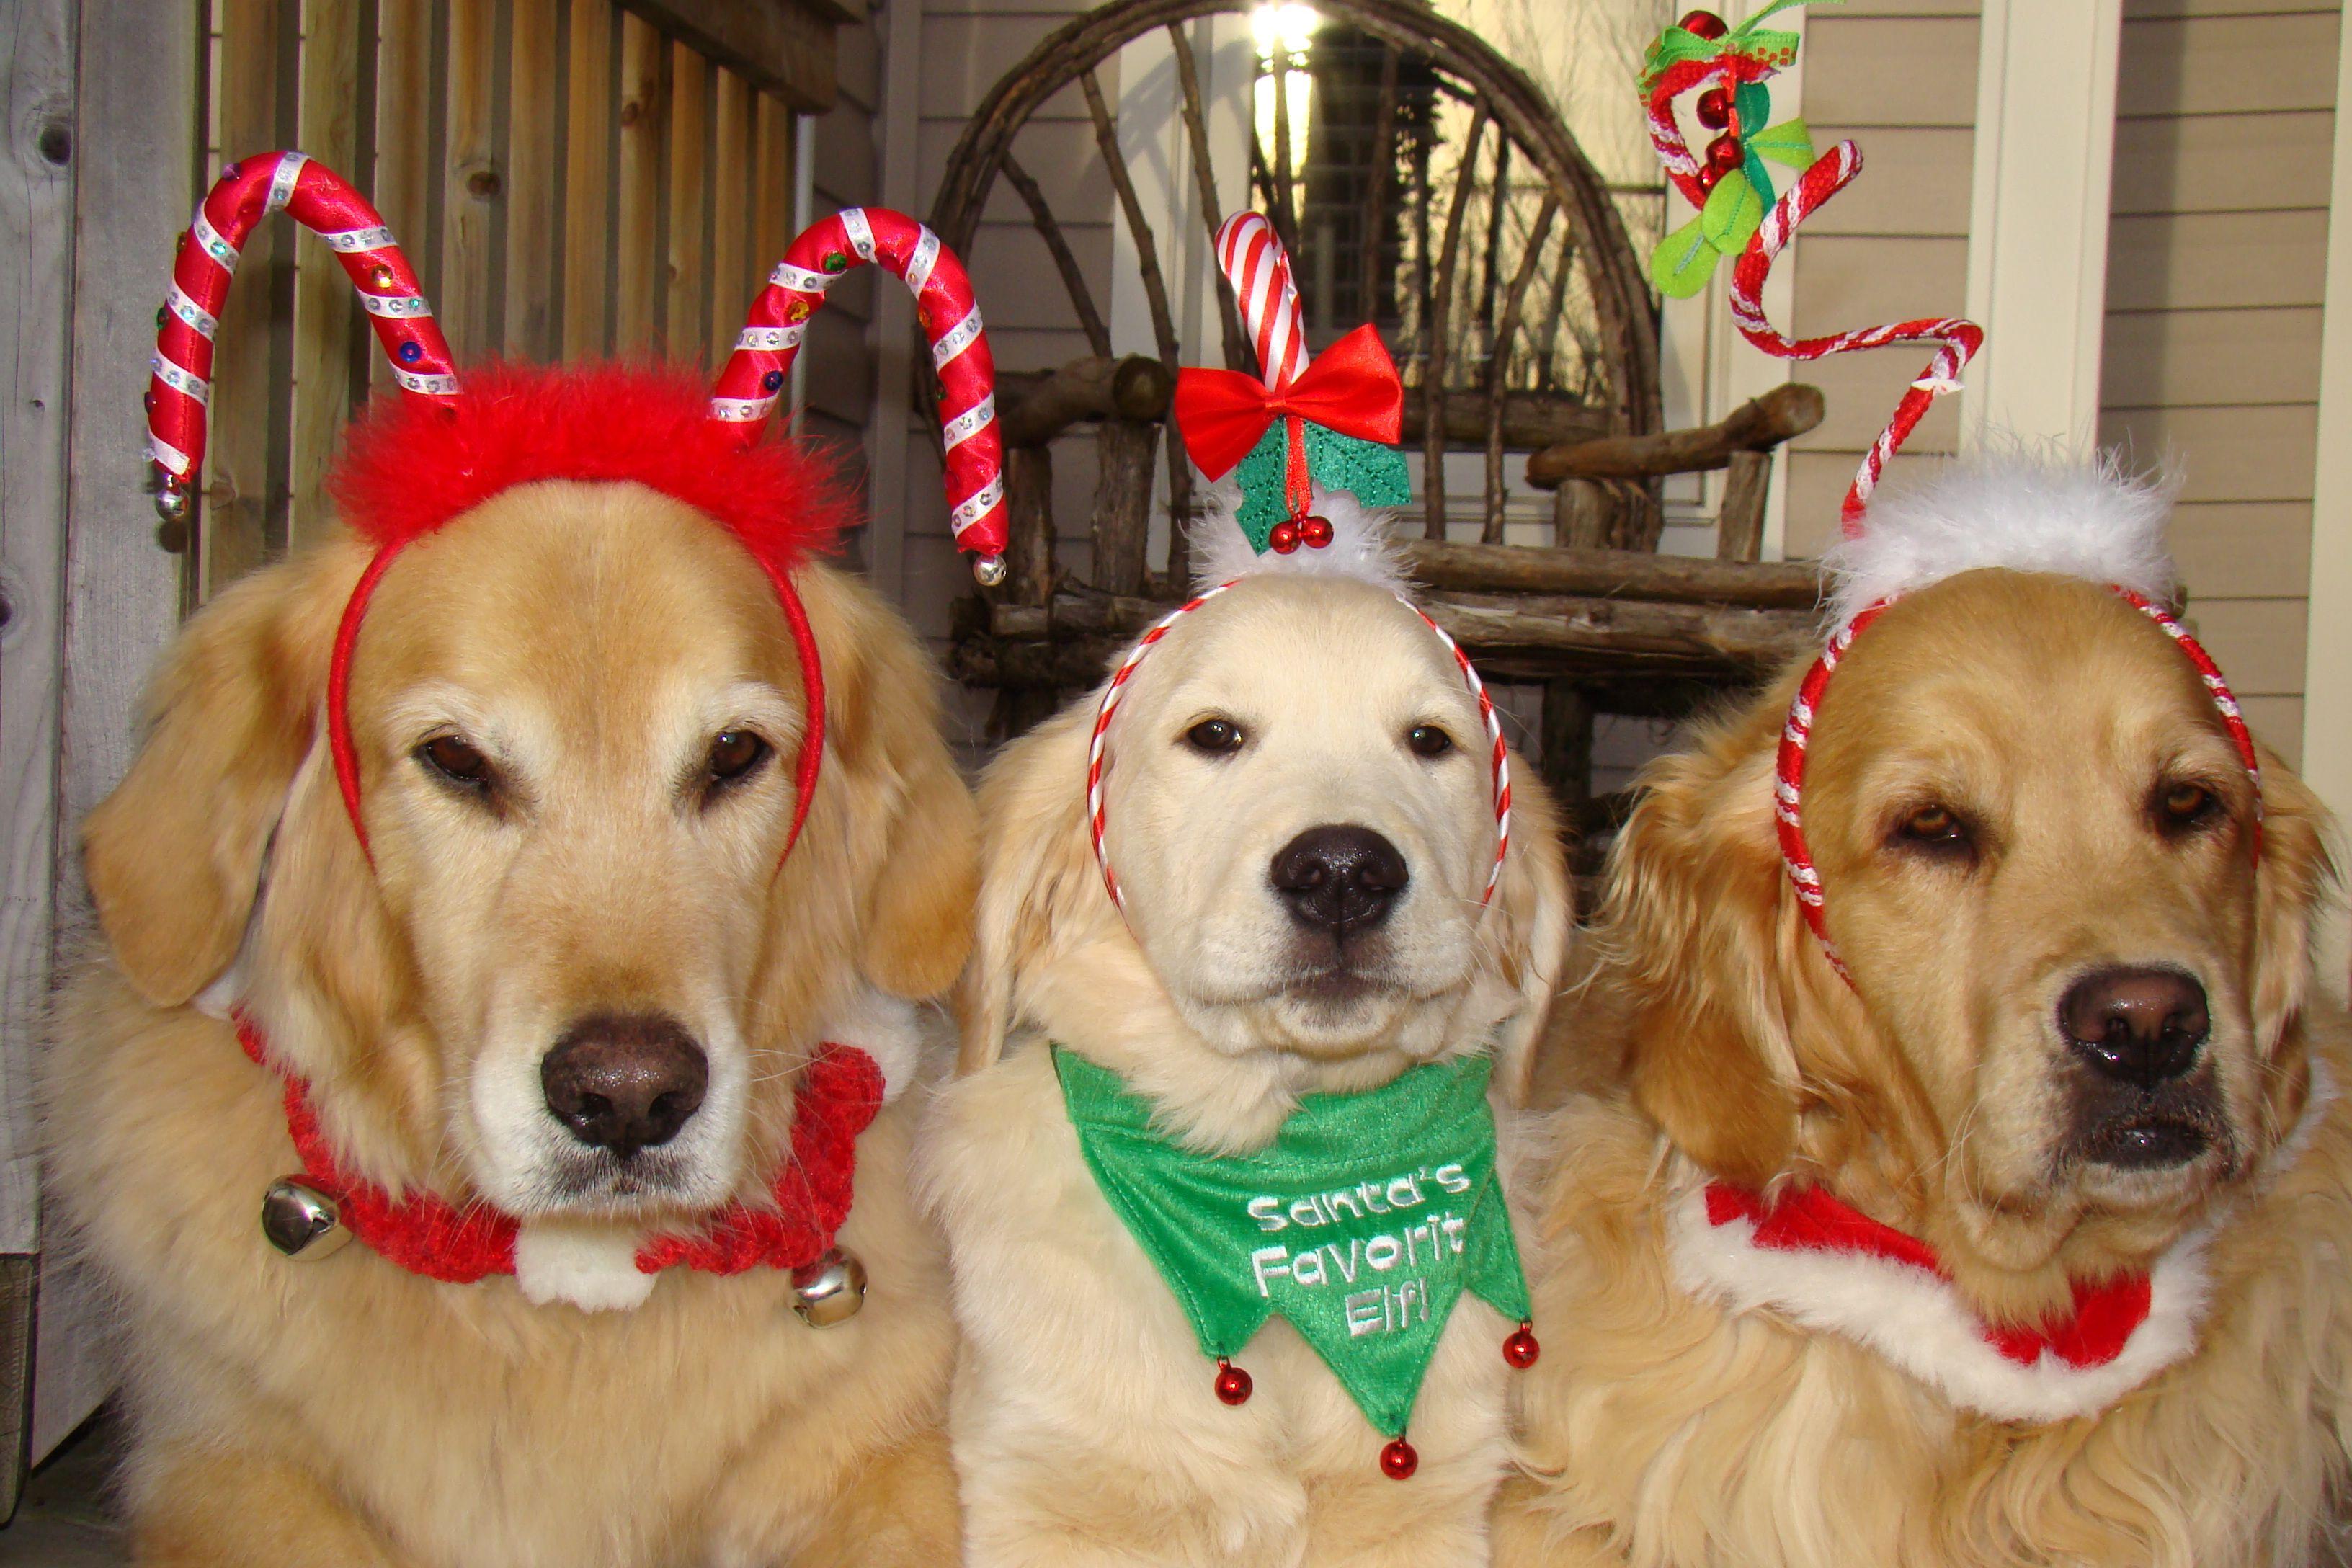 White English Cream Golden Retriever and Golden's Christmas ~ SO CHARMINGLY FUNNY ~